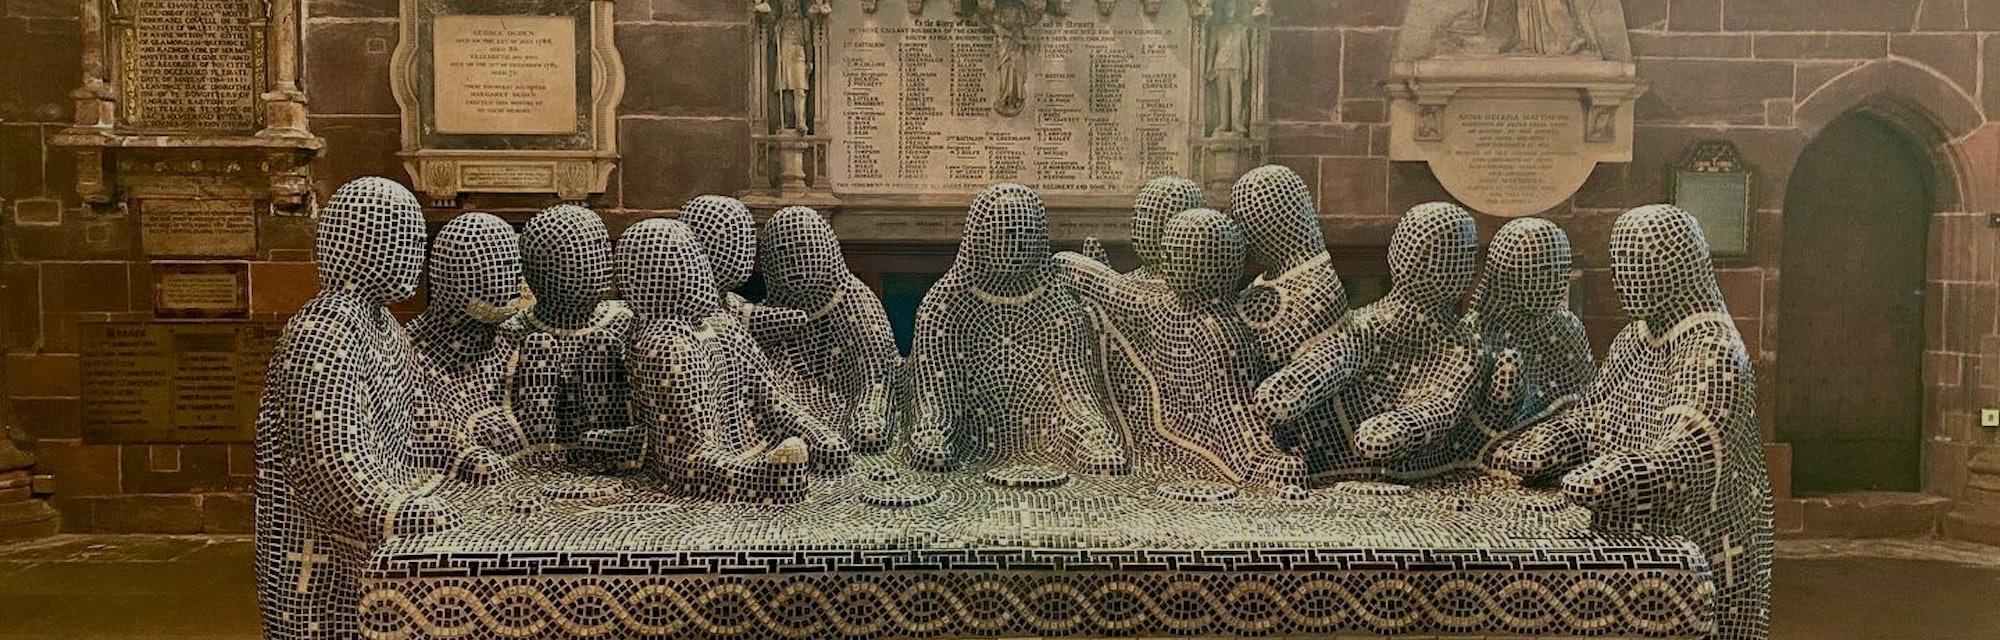 Last Supper keyboard mosaic sculpture